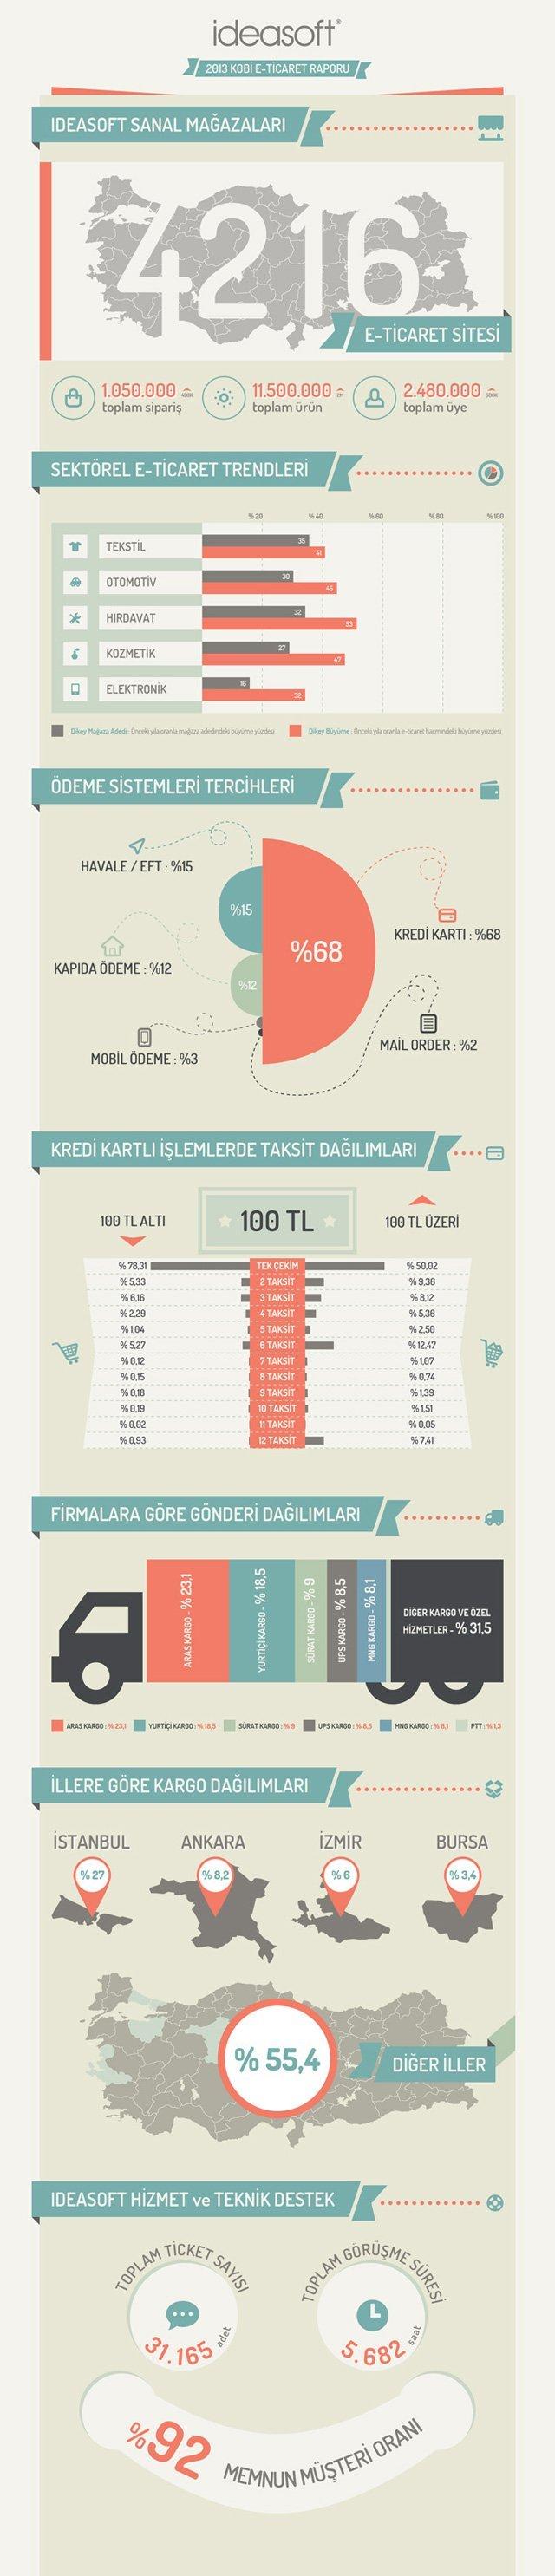 ideasoft-infografik-2014-TR-640